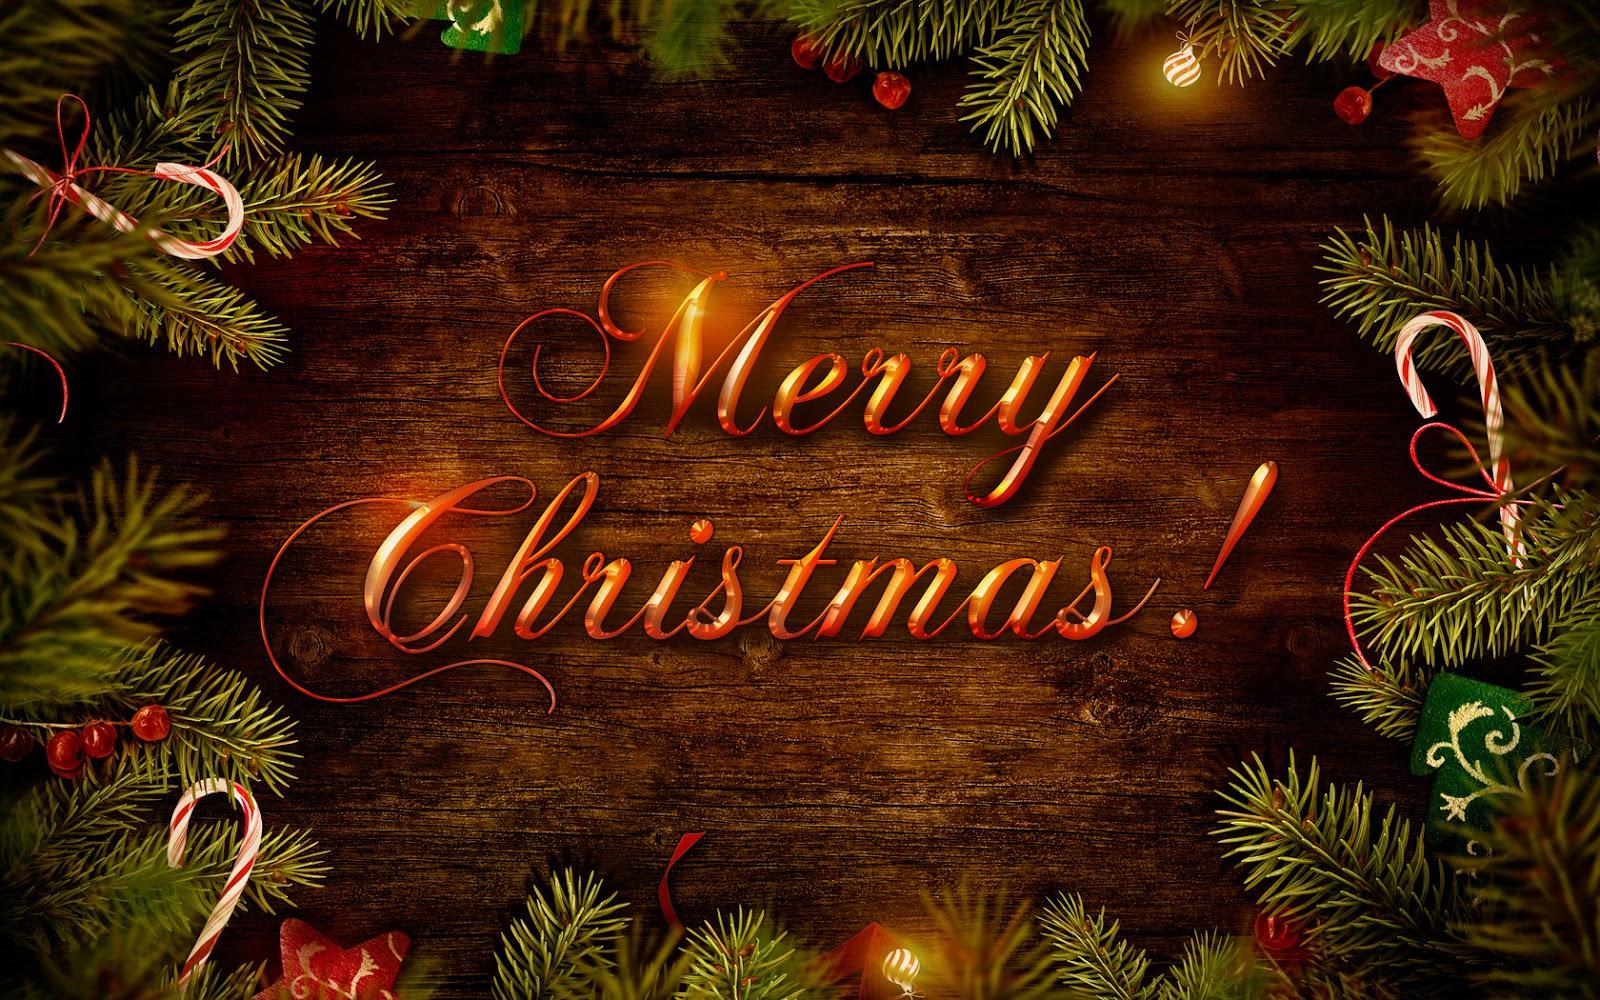 merry-christmas-1680x1050-wooden-board-theme-green-leaf-template.jpg